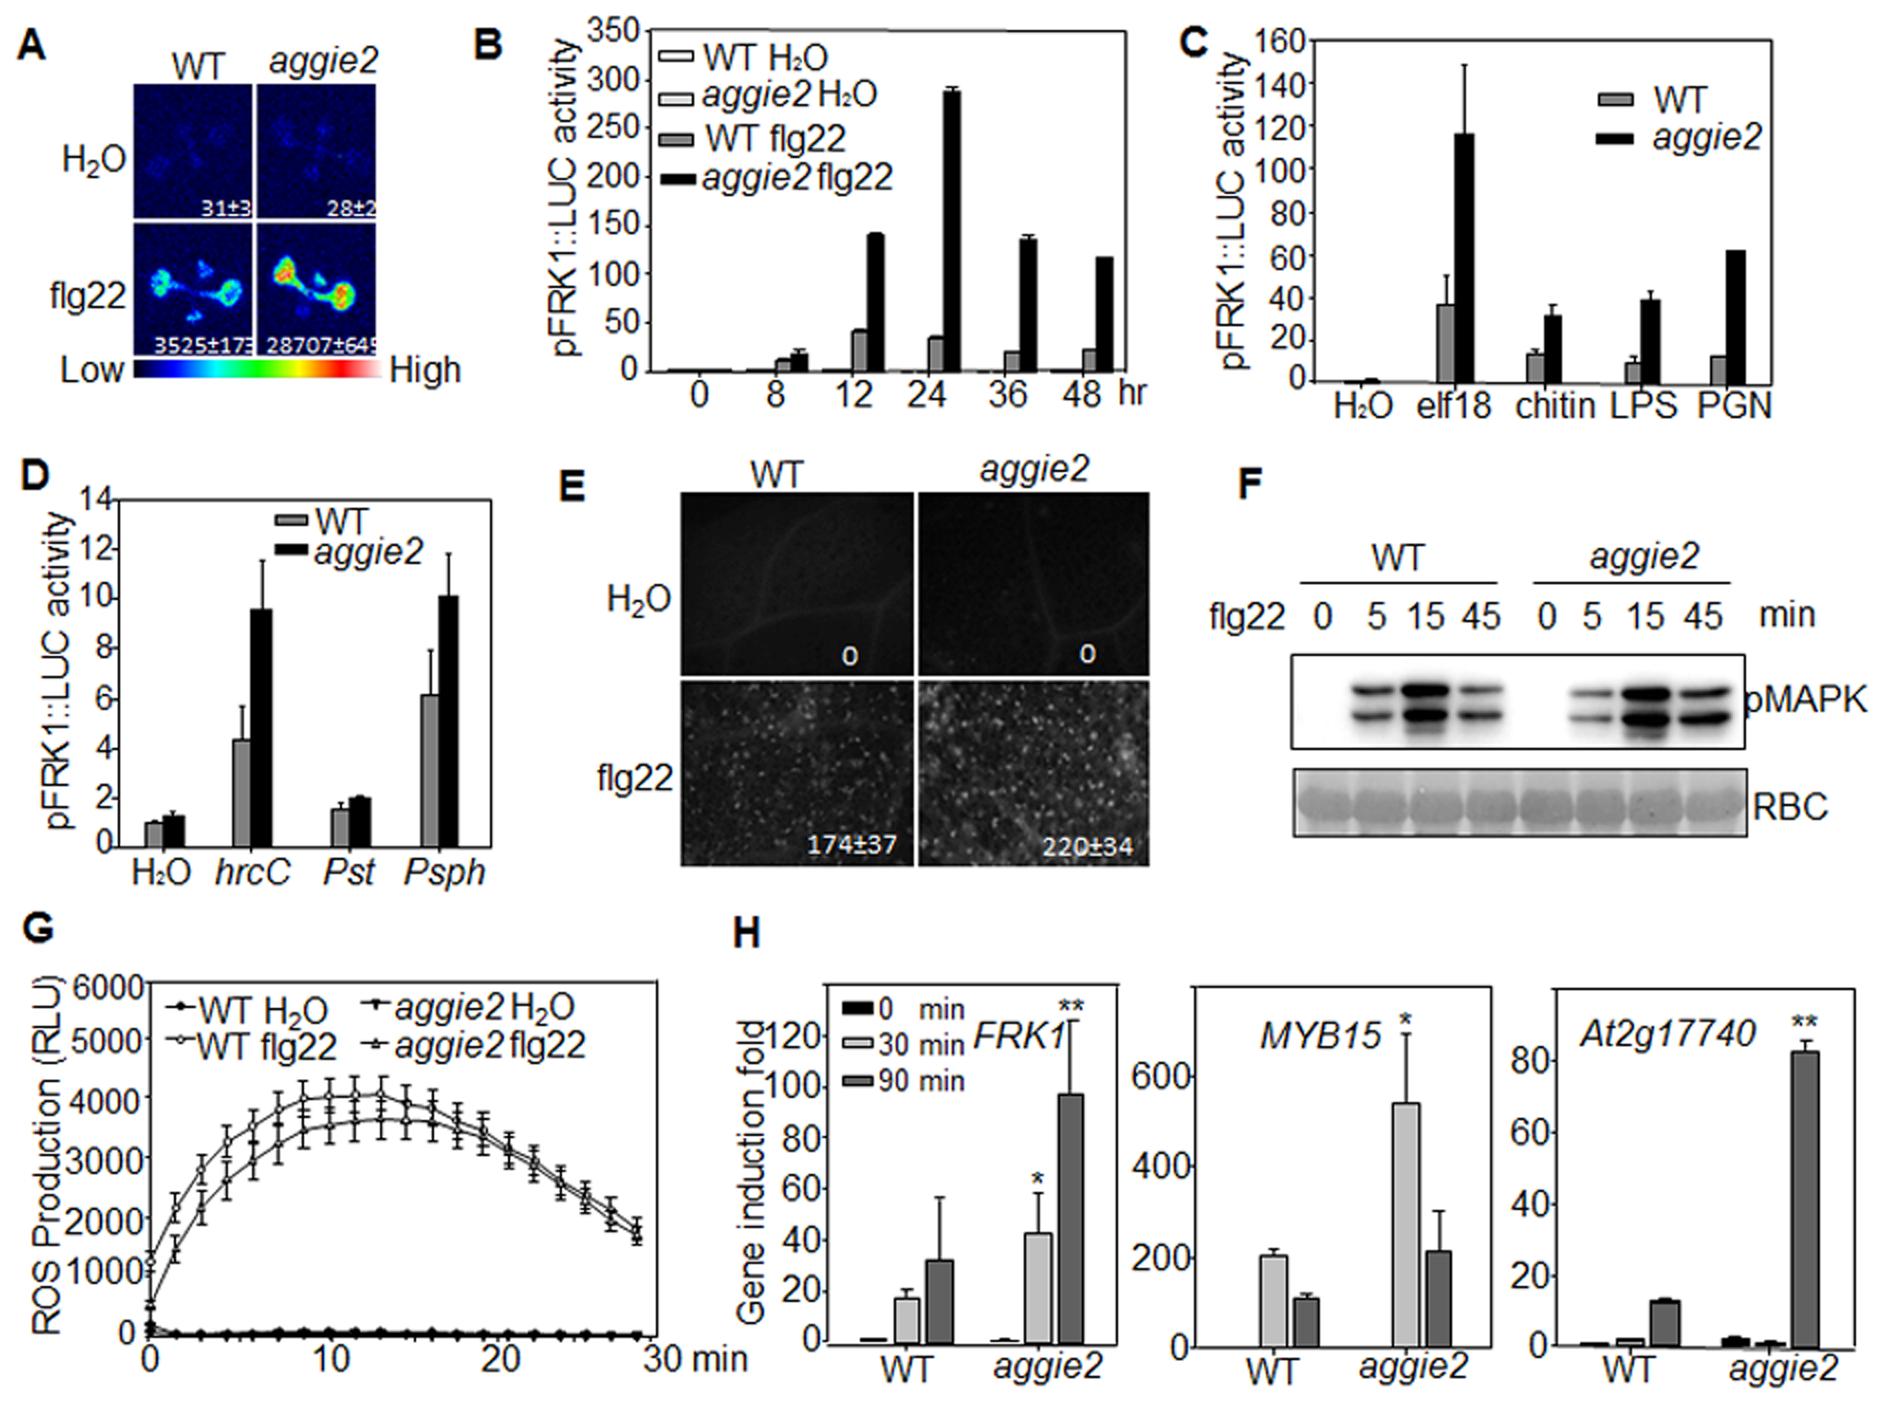 Elevated <i>pFRK1::LUC</i> expression and MAMP-triggered immune response in <i>aggie2</i> mutant.